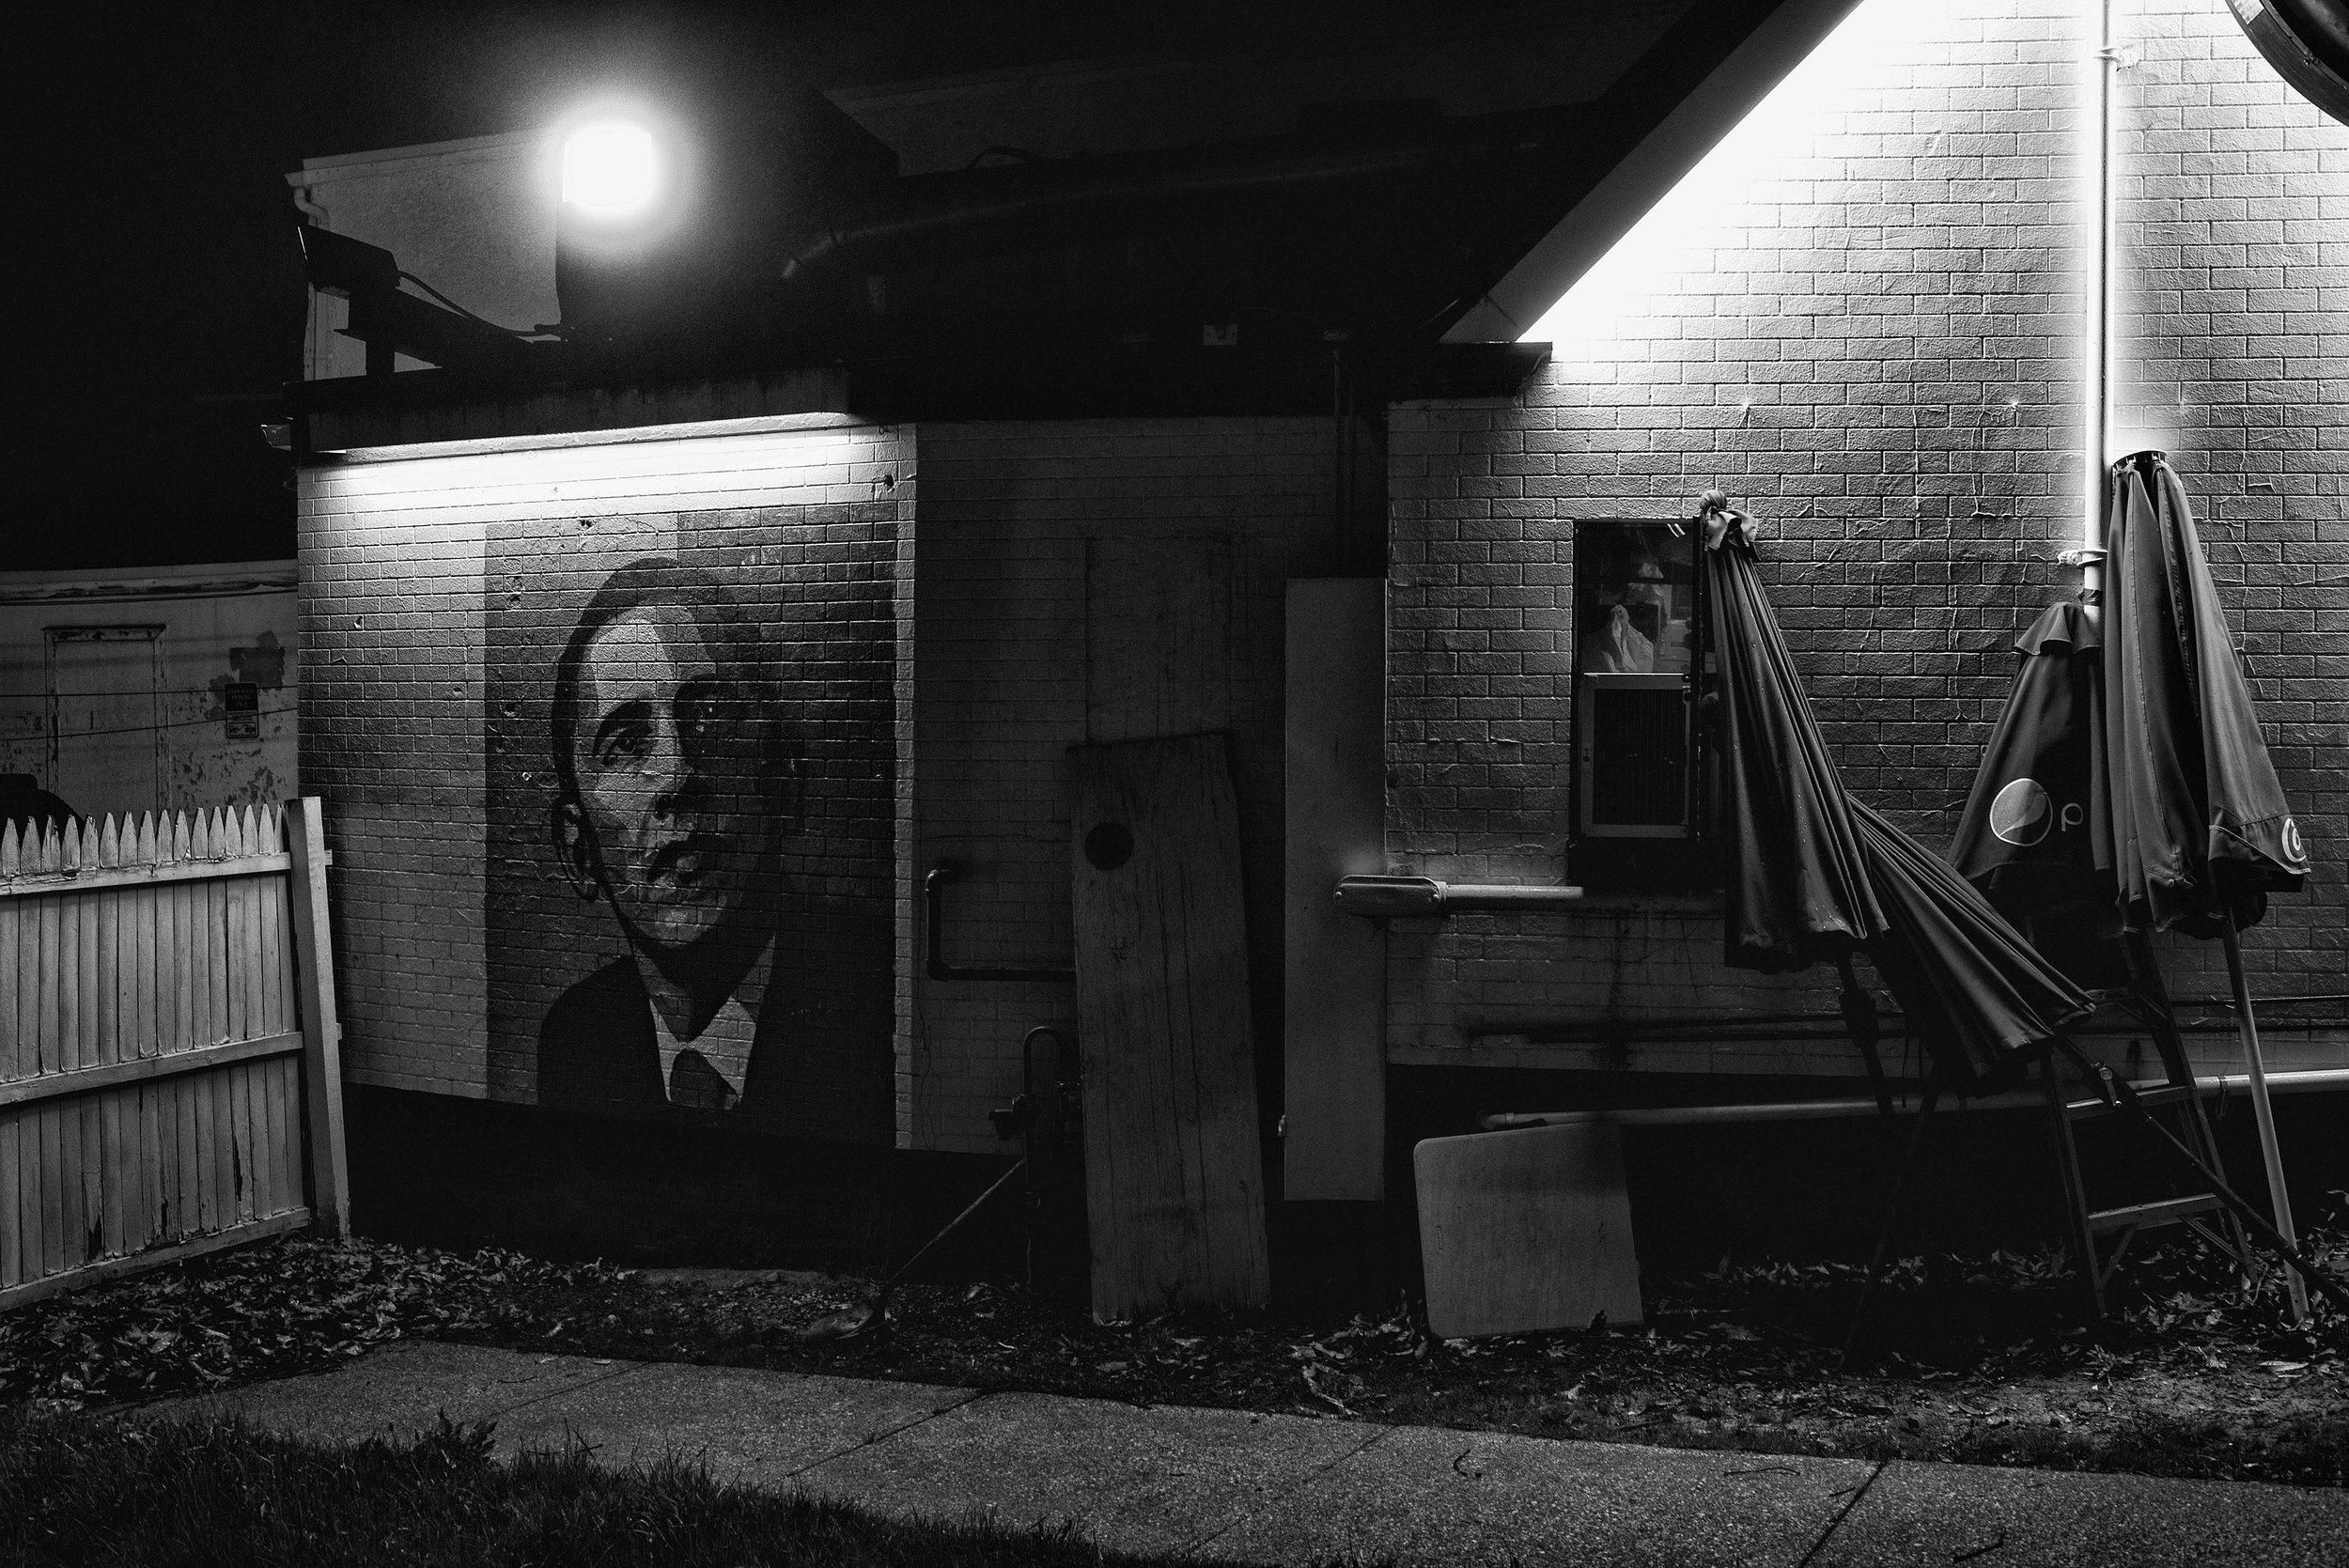 Day 66 : A mural of former president Barack Obama at the Steak 'n Egg restaurant, on March 26, 2017.